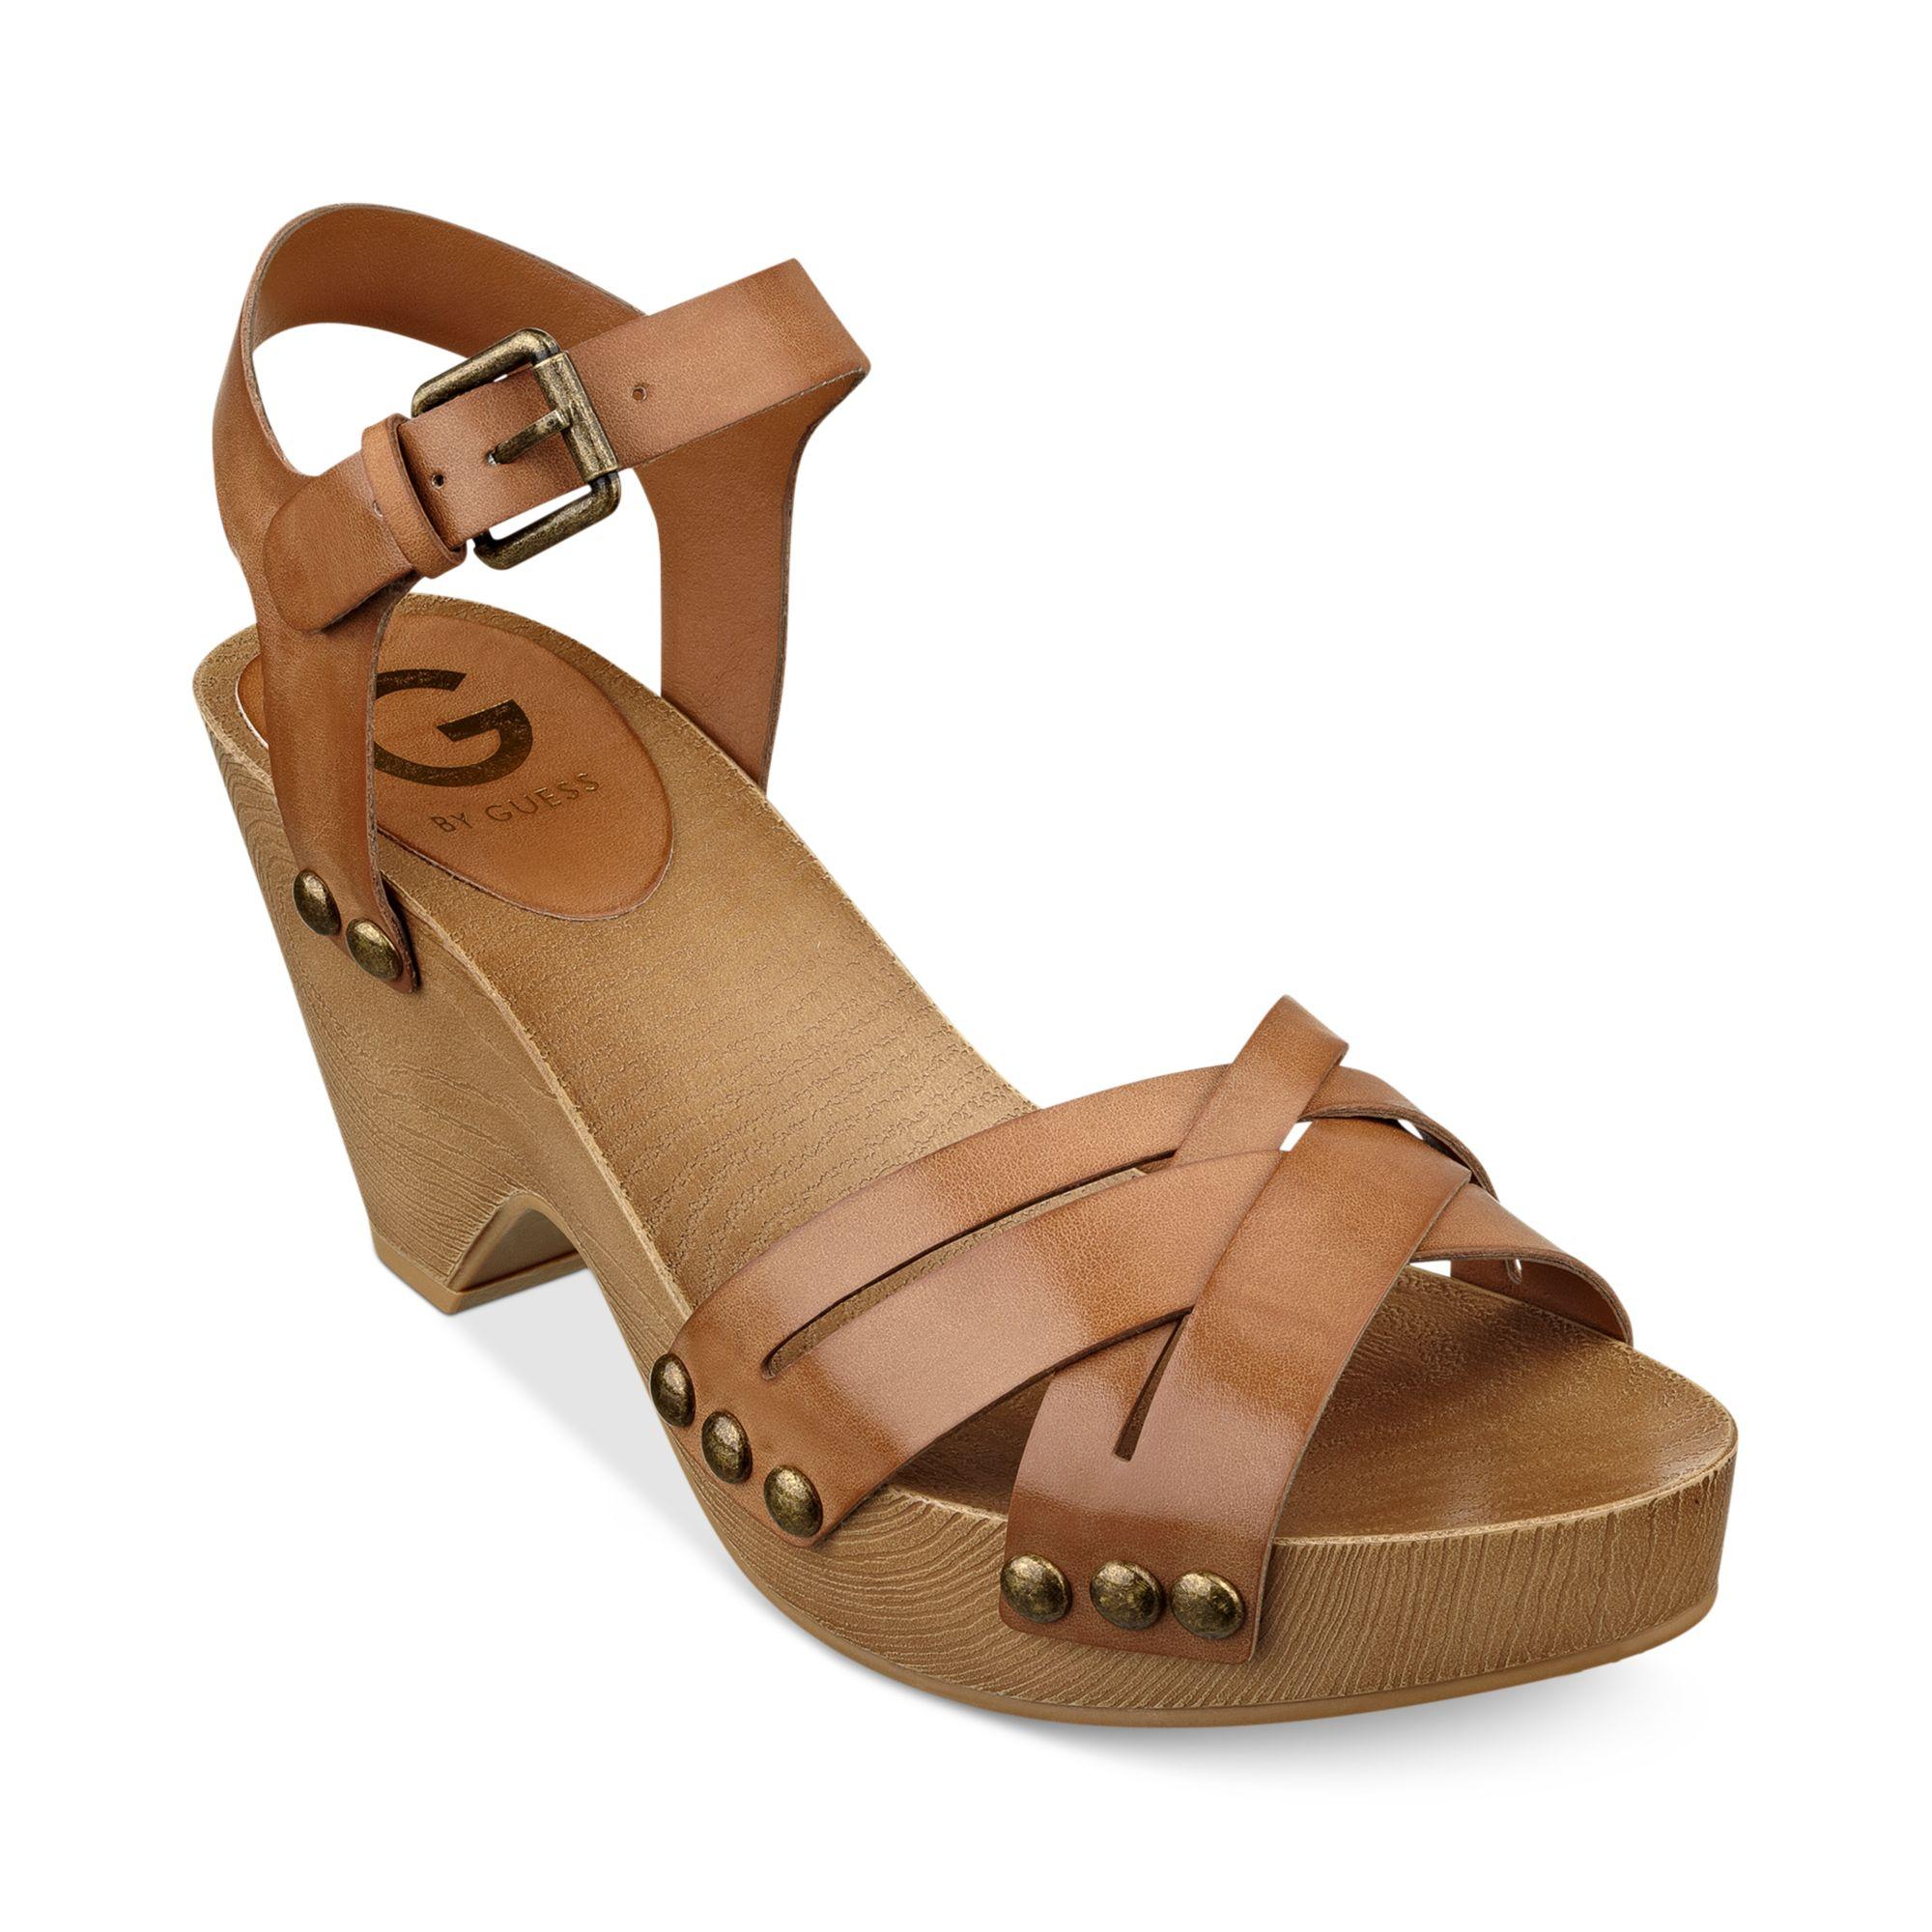 7efa6cbcc87 Lyst guess womens jackal platform clog sandals in brown jpg 2000x2000 Clog  sandals